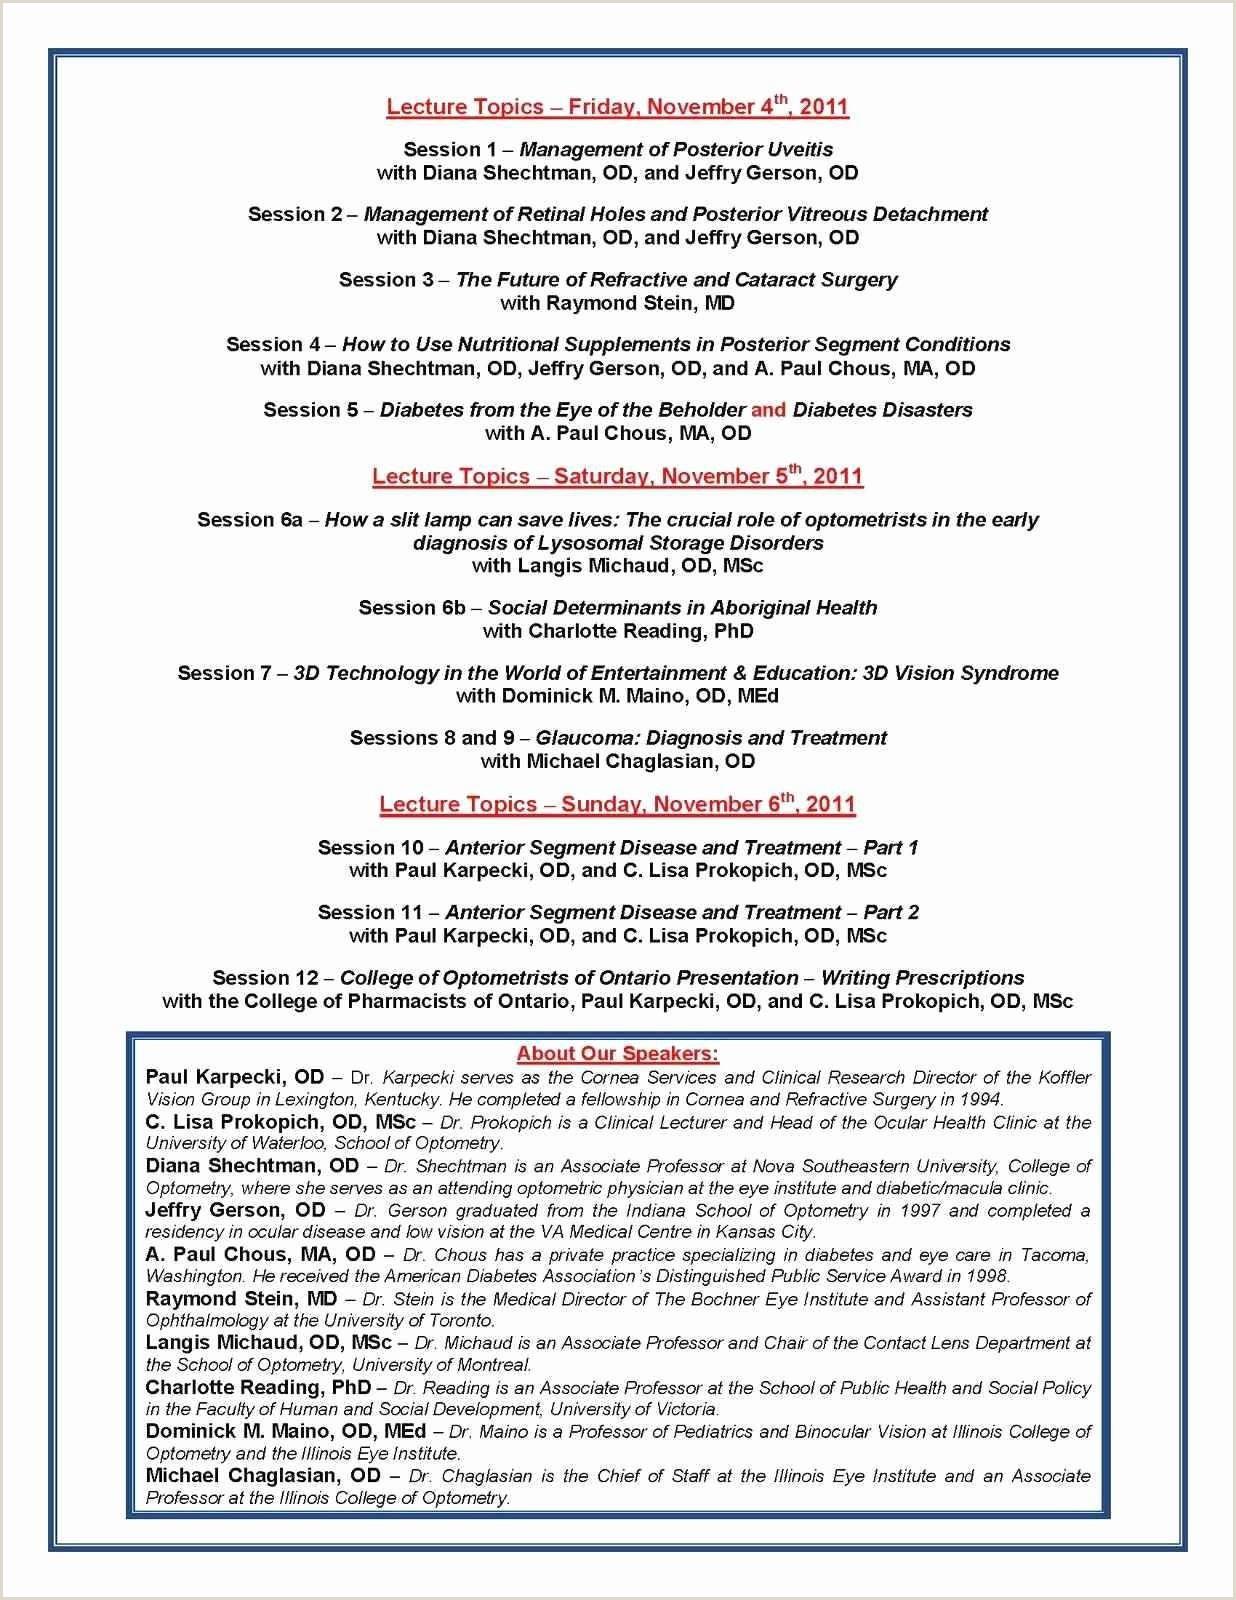 Curriculum Vitae Gratis Para Rellenar E Imprimir formato De Diplomas Para Llenar